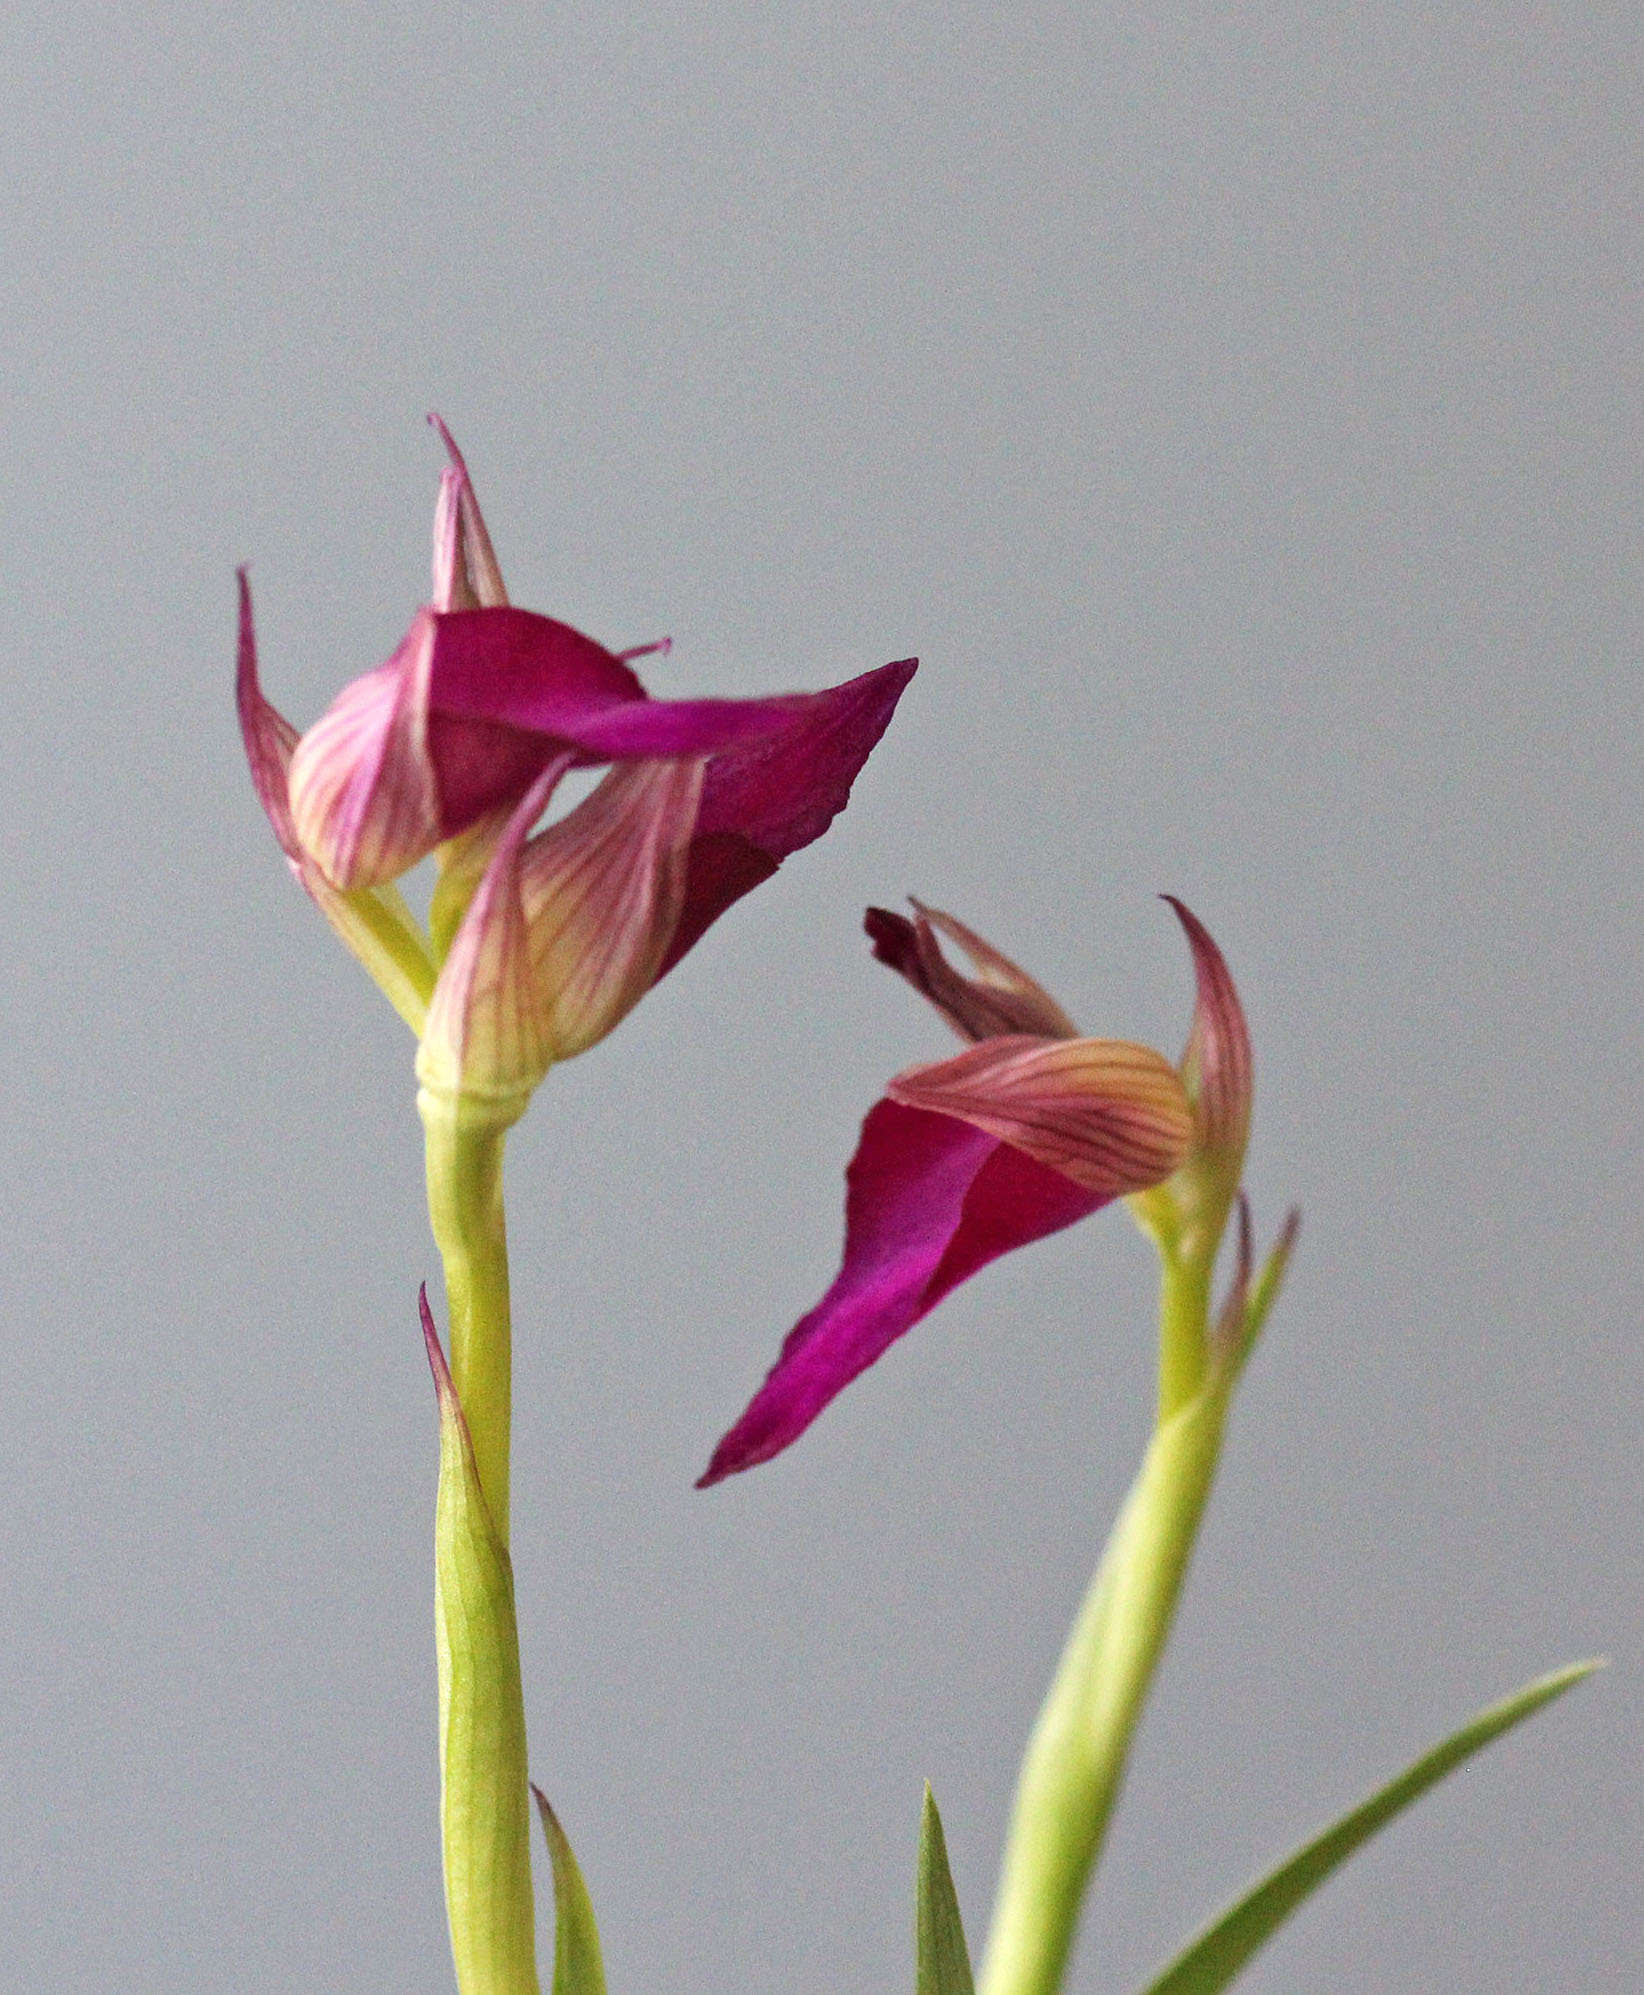 Orchiserapias capitata 'Lady Samantha'_d0007501_09125305.jpg